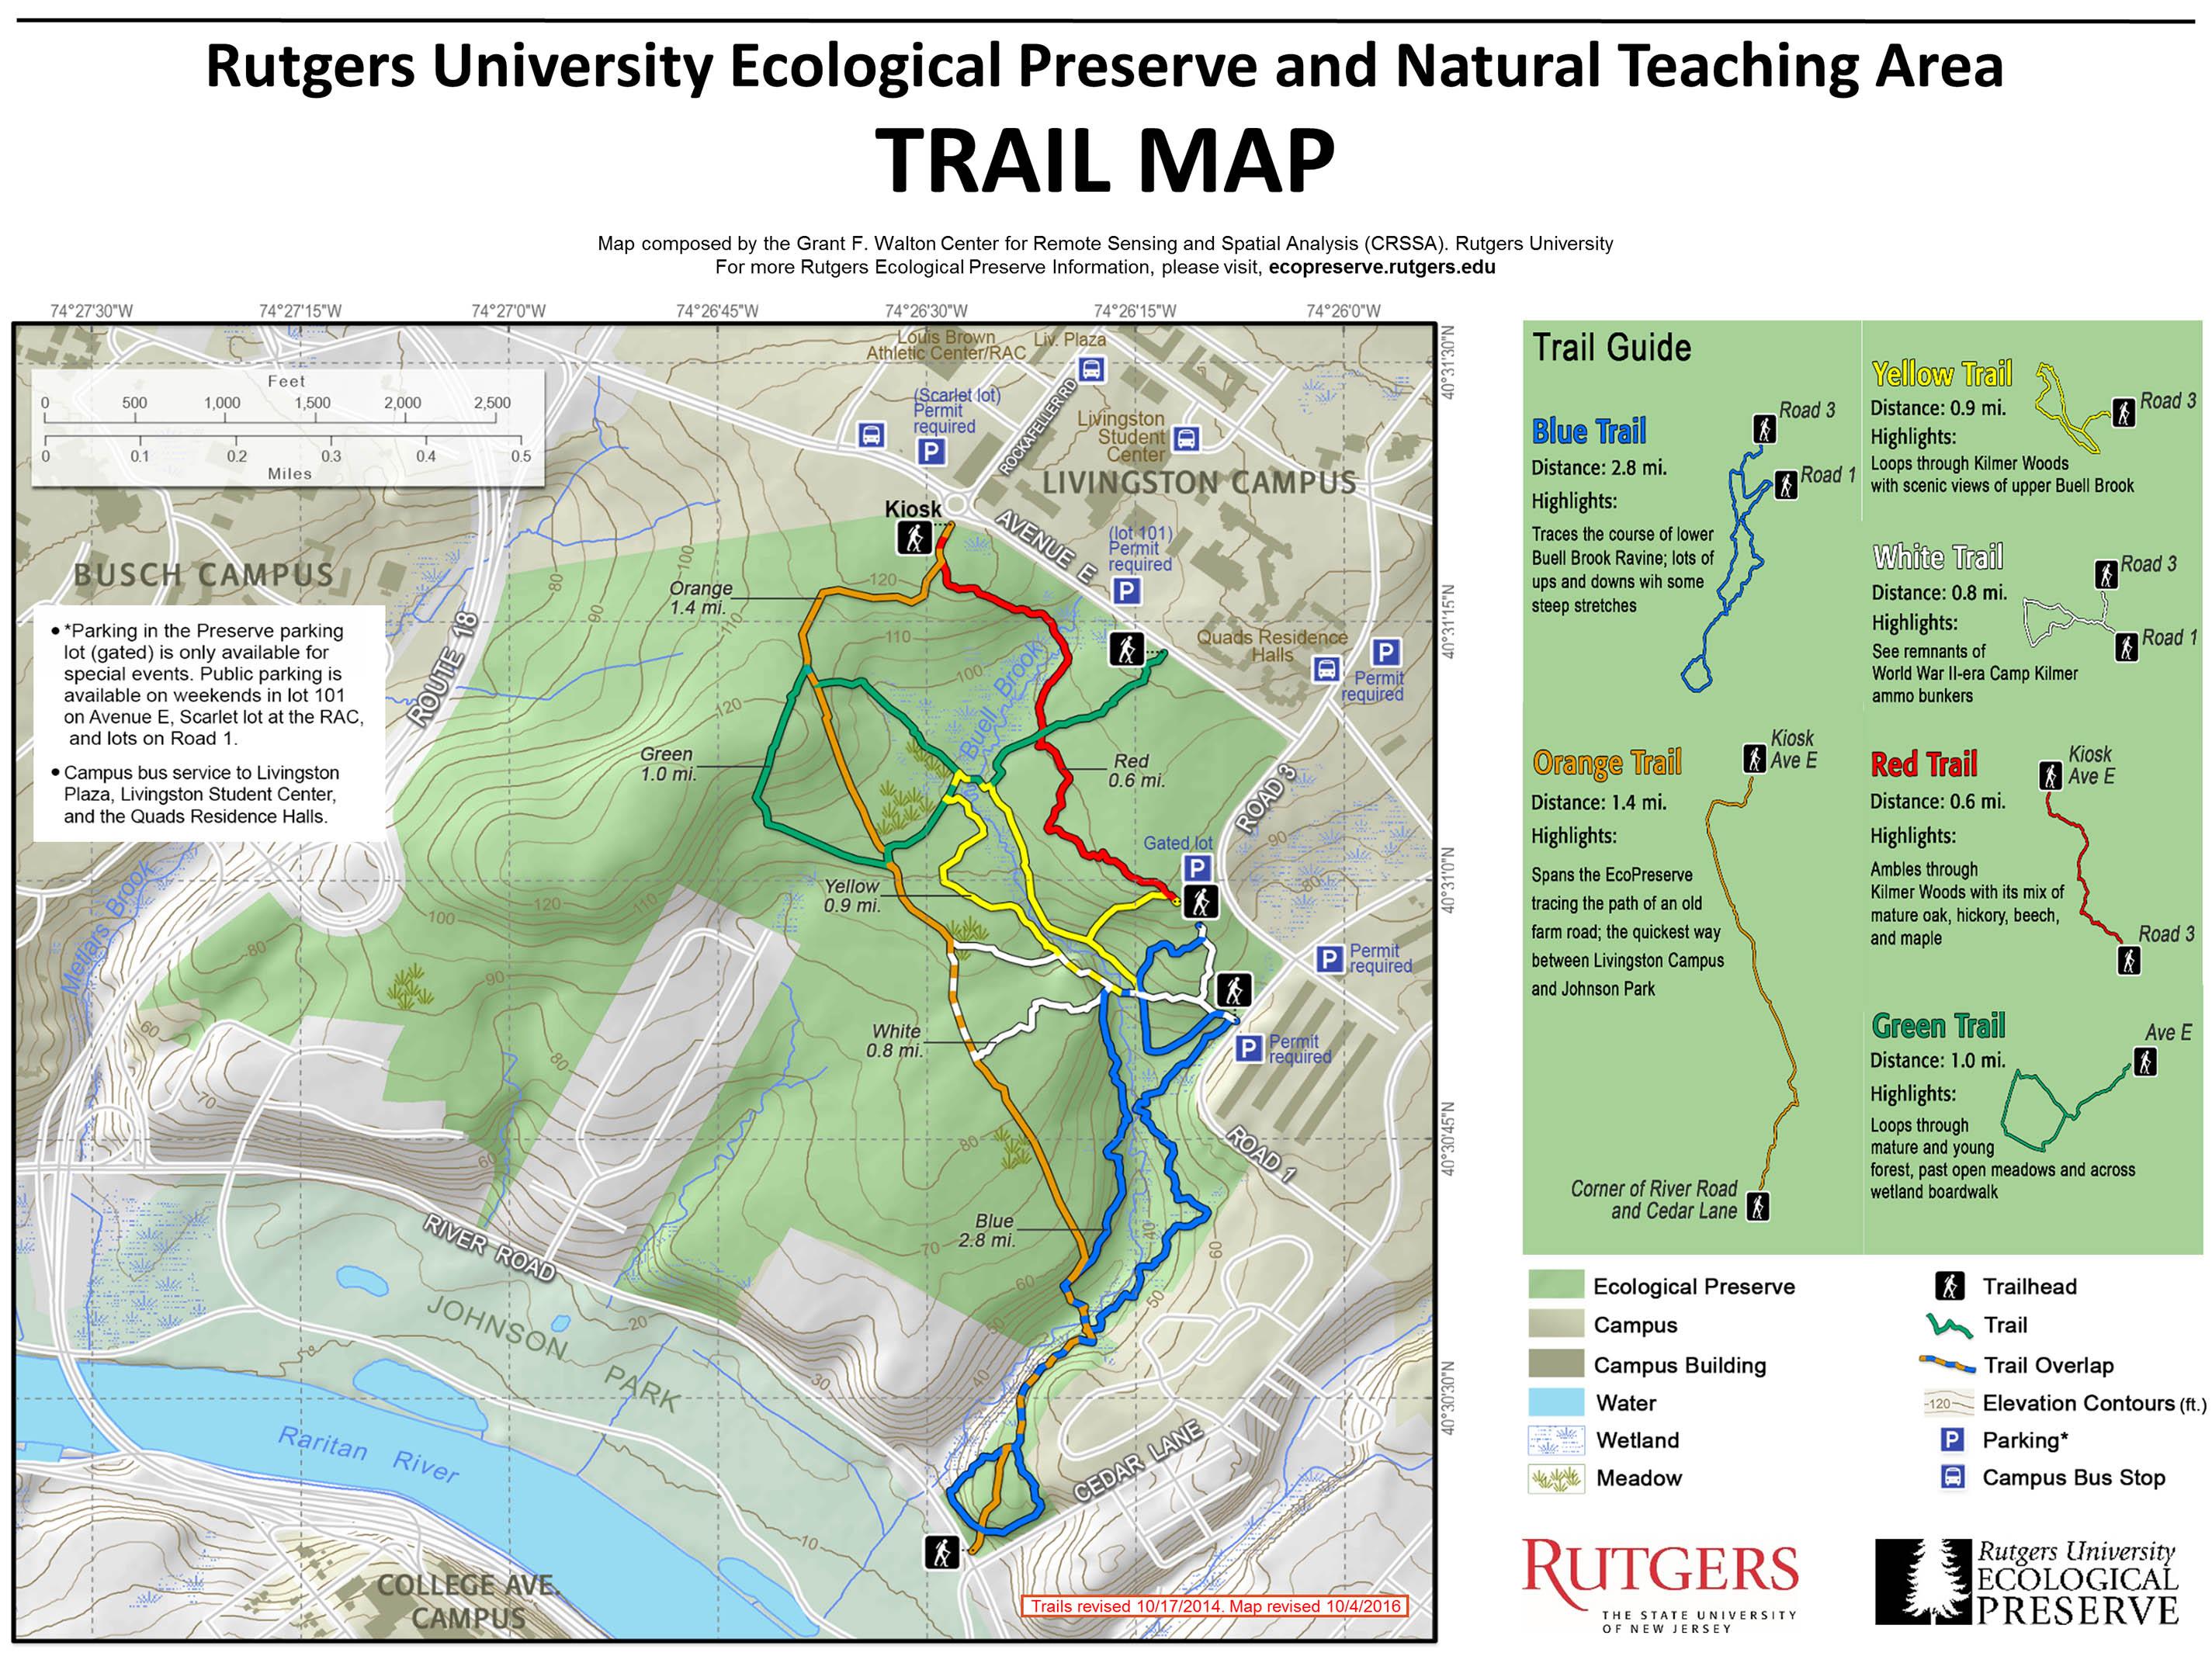 Rutgers University Ecopreserve Naturefind